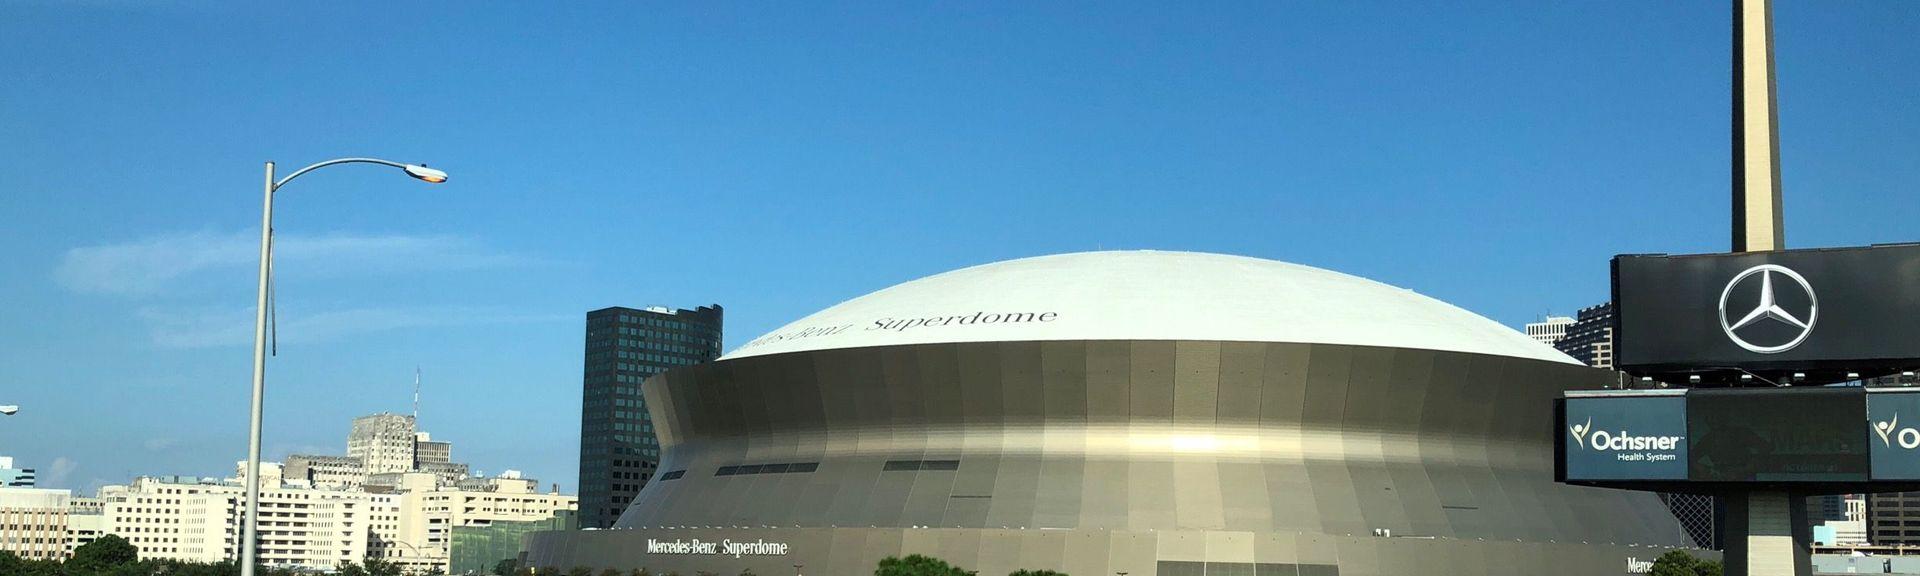 Mercedes-Benz Superdome, New Orleans, Louisiana, USA